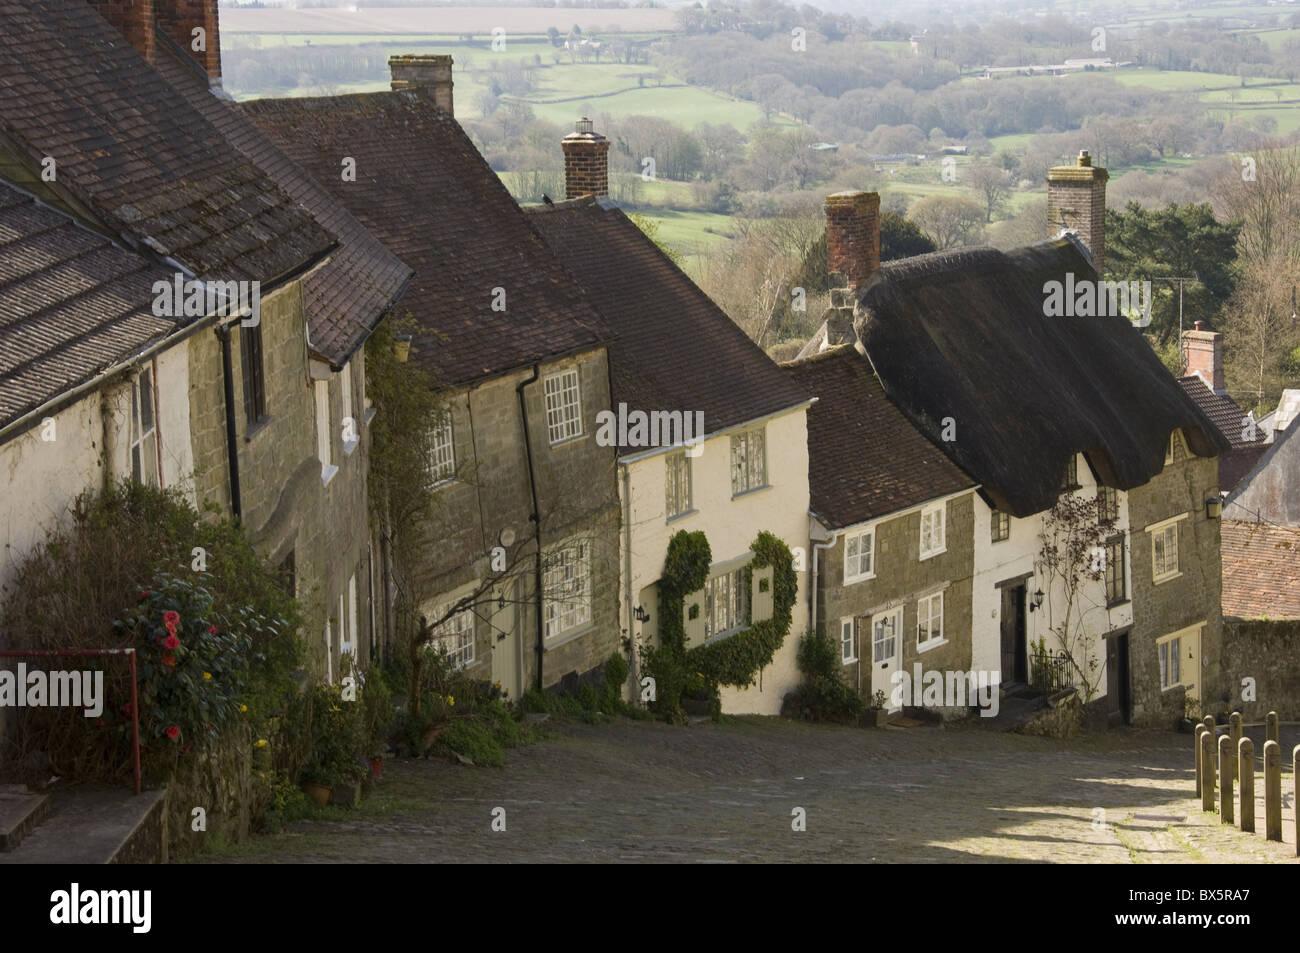 Gold Hill, Shaftesbury, Wiltshire, England, United Kingdom, Europe - Stock Image